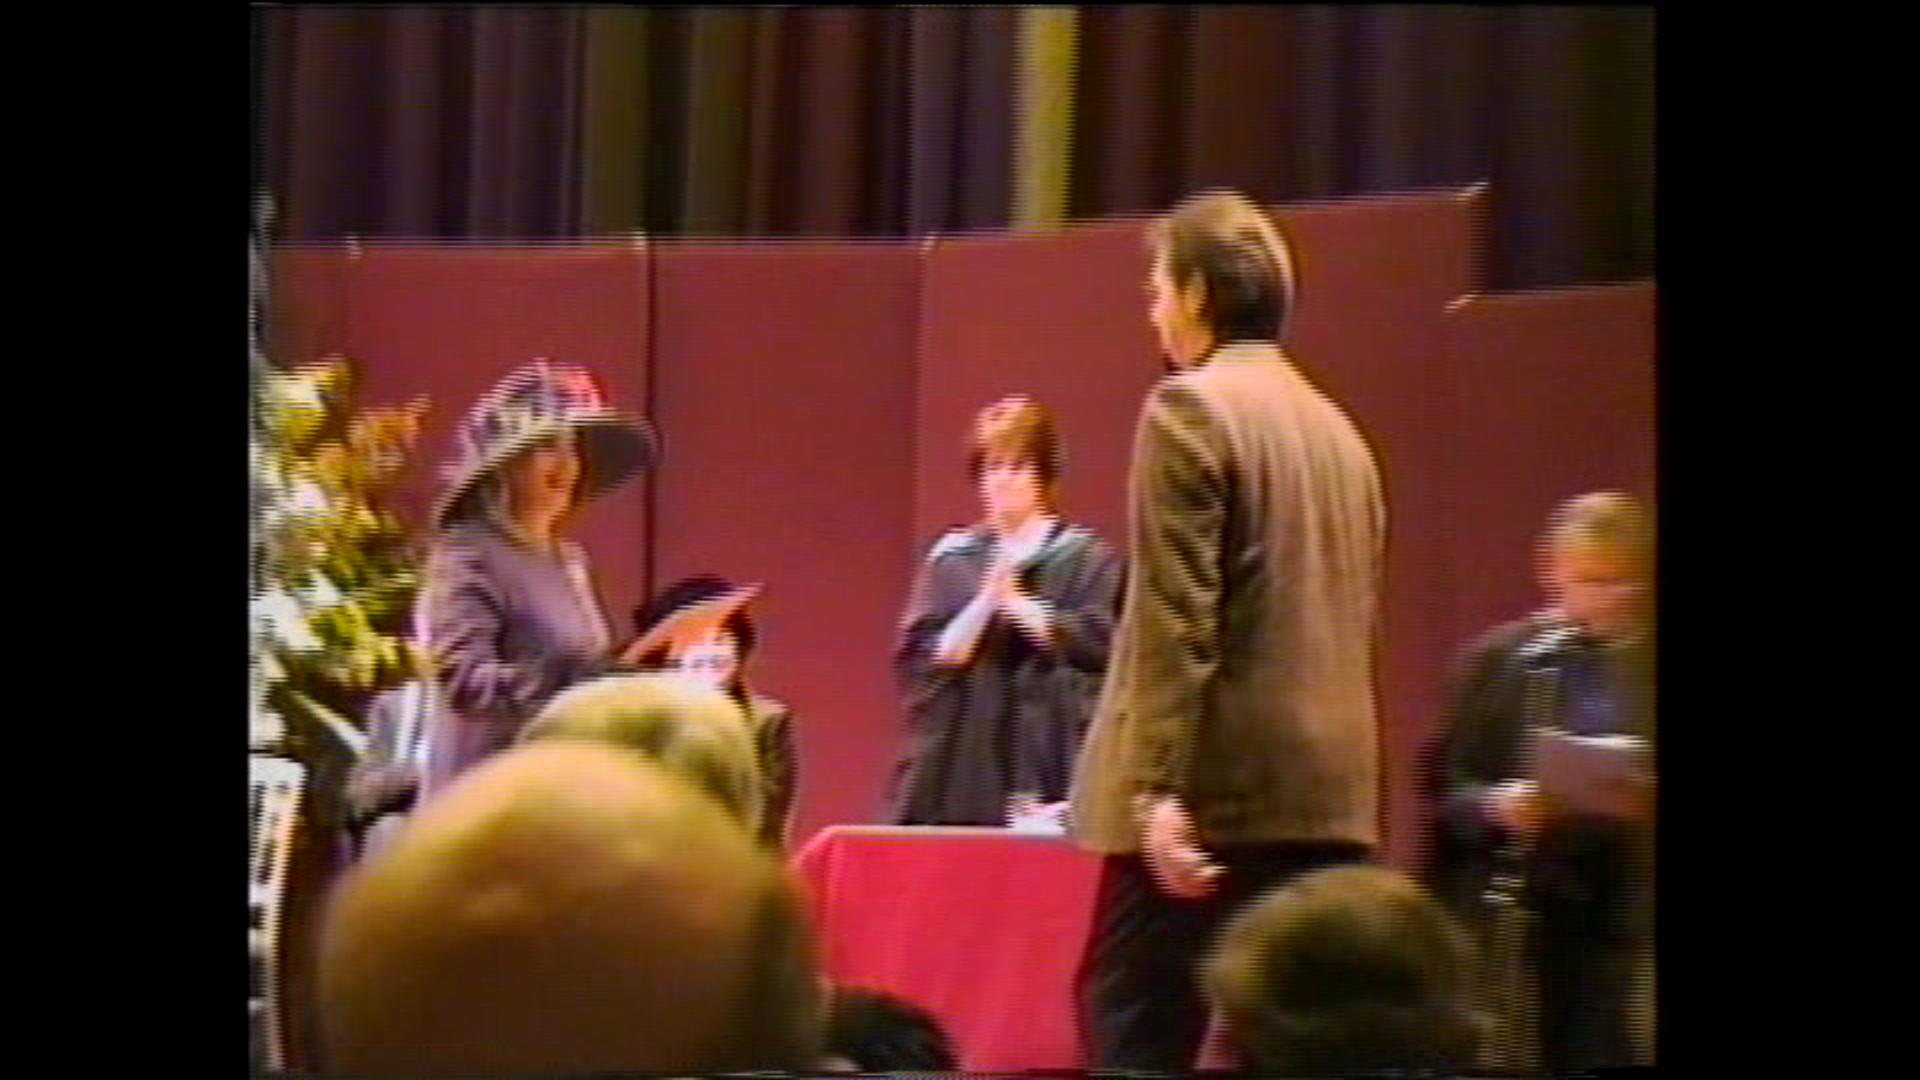 Graduation Ceremony at Guidhall School of Music, London, UK, 1999.